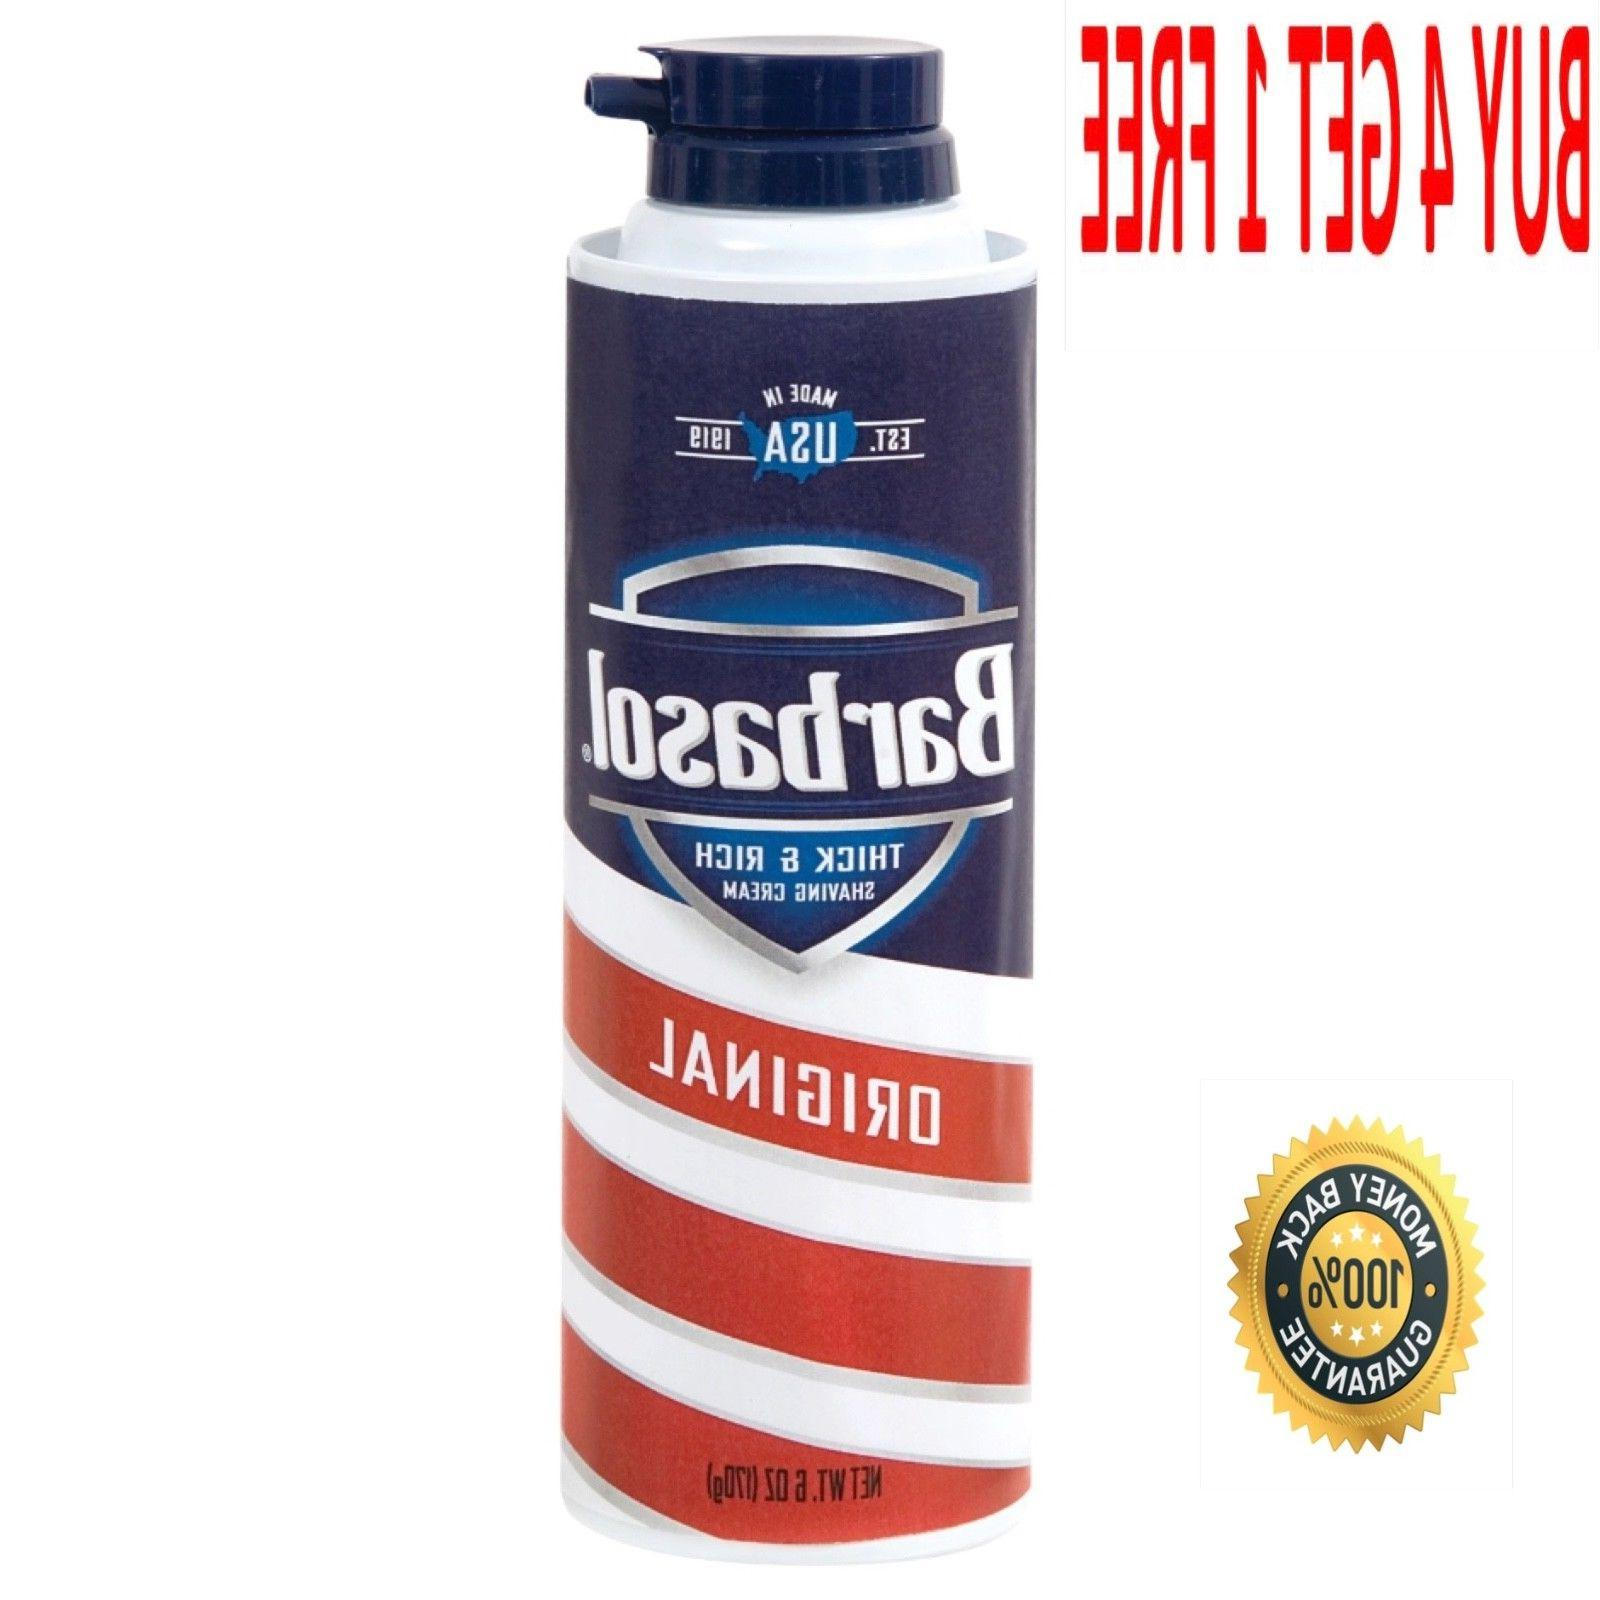 barbasol original shaving 6 oz cans 5